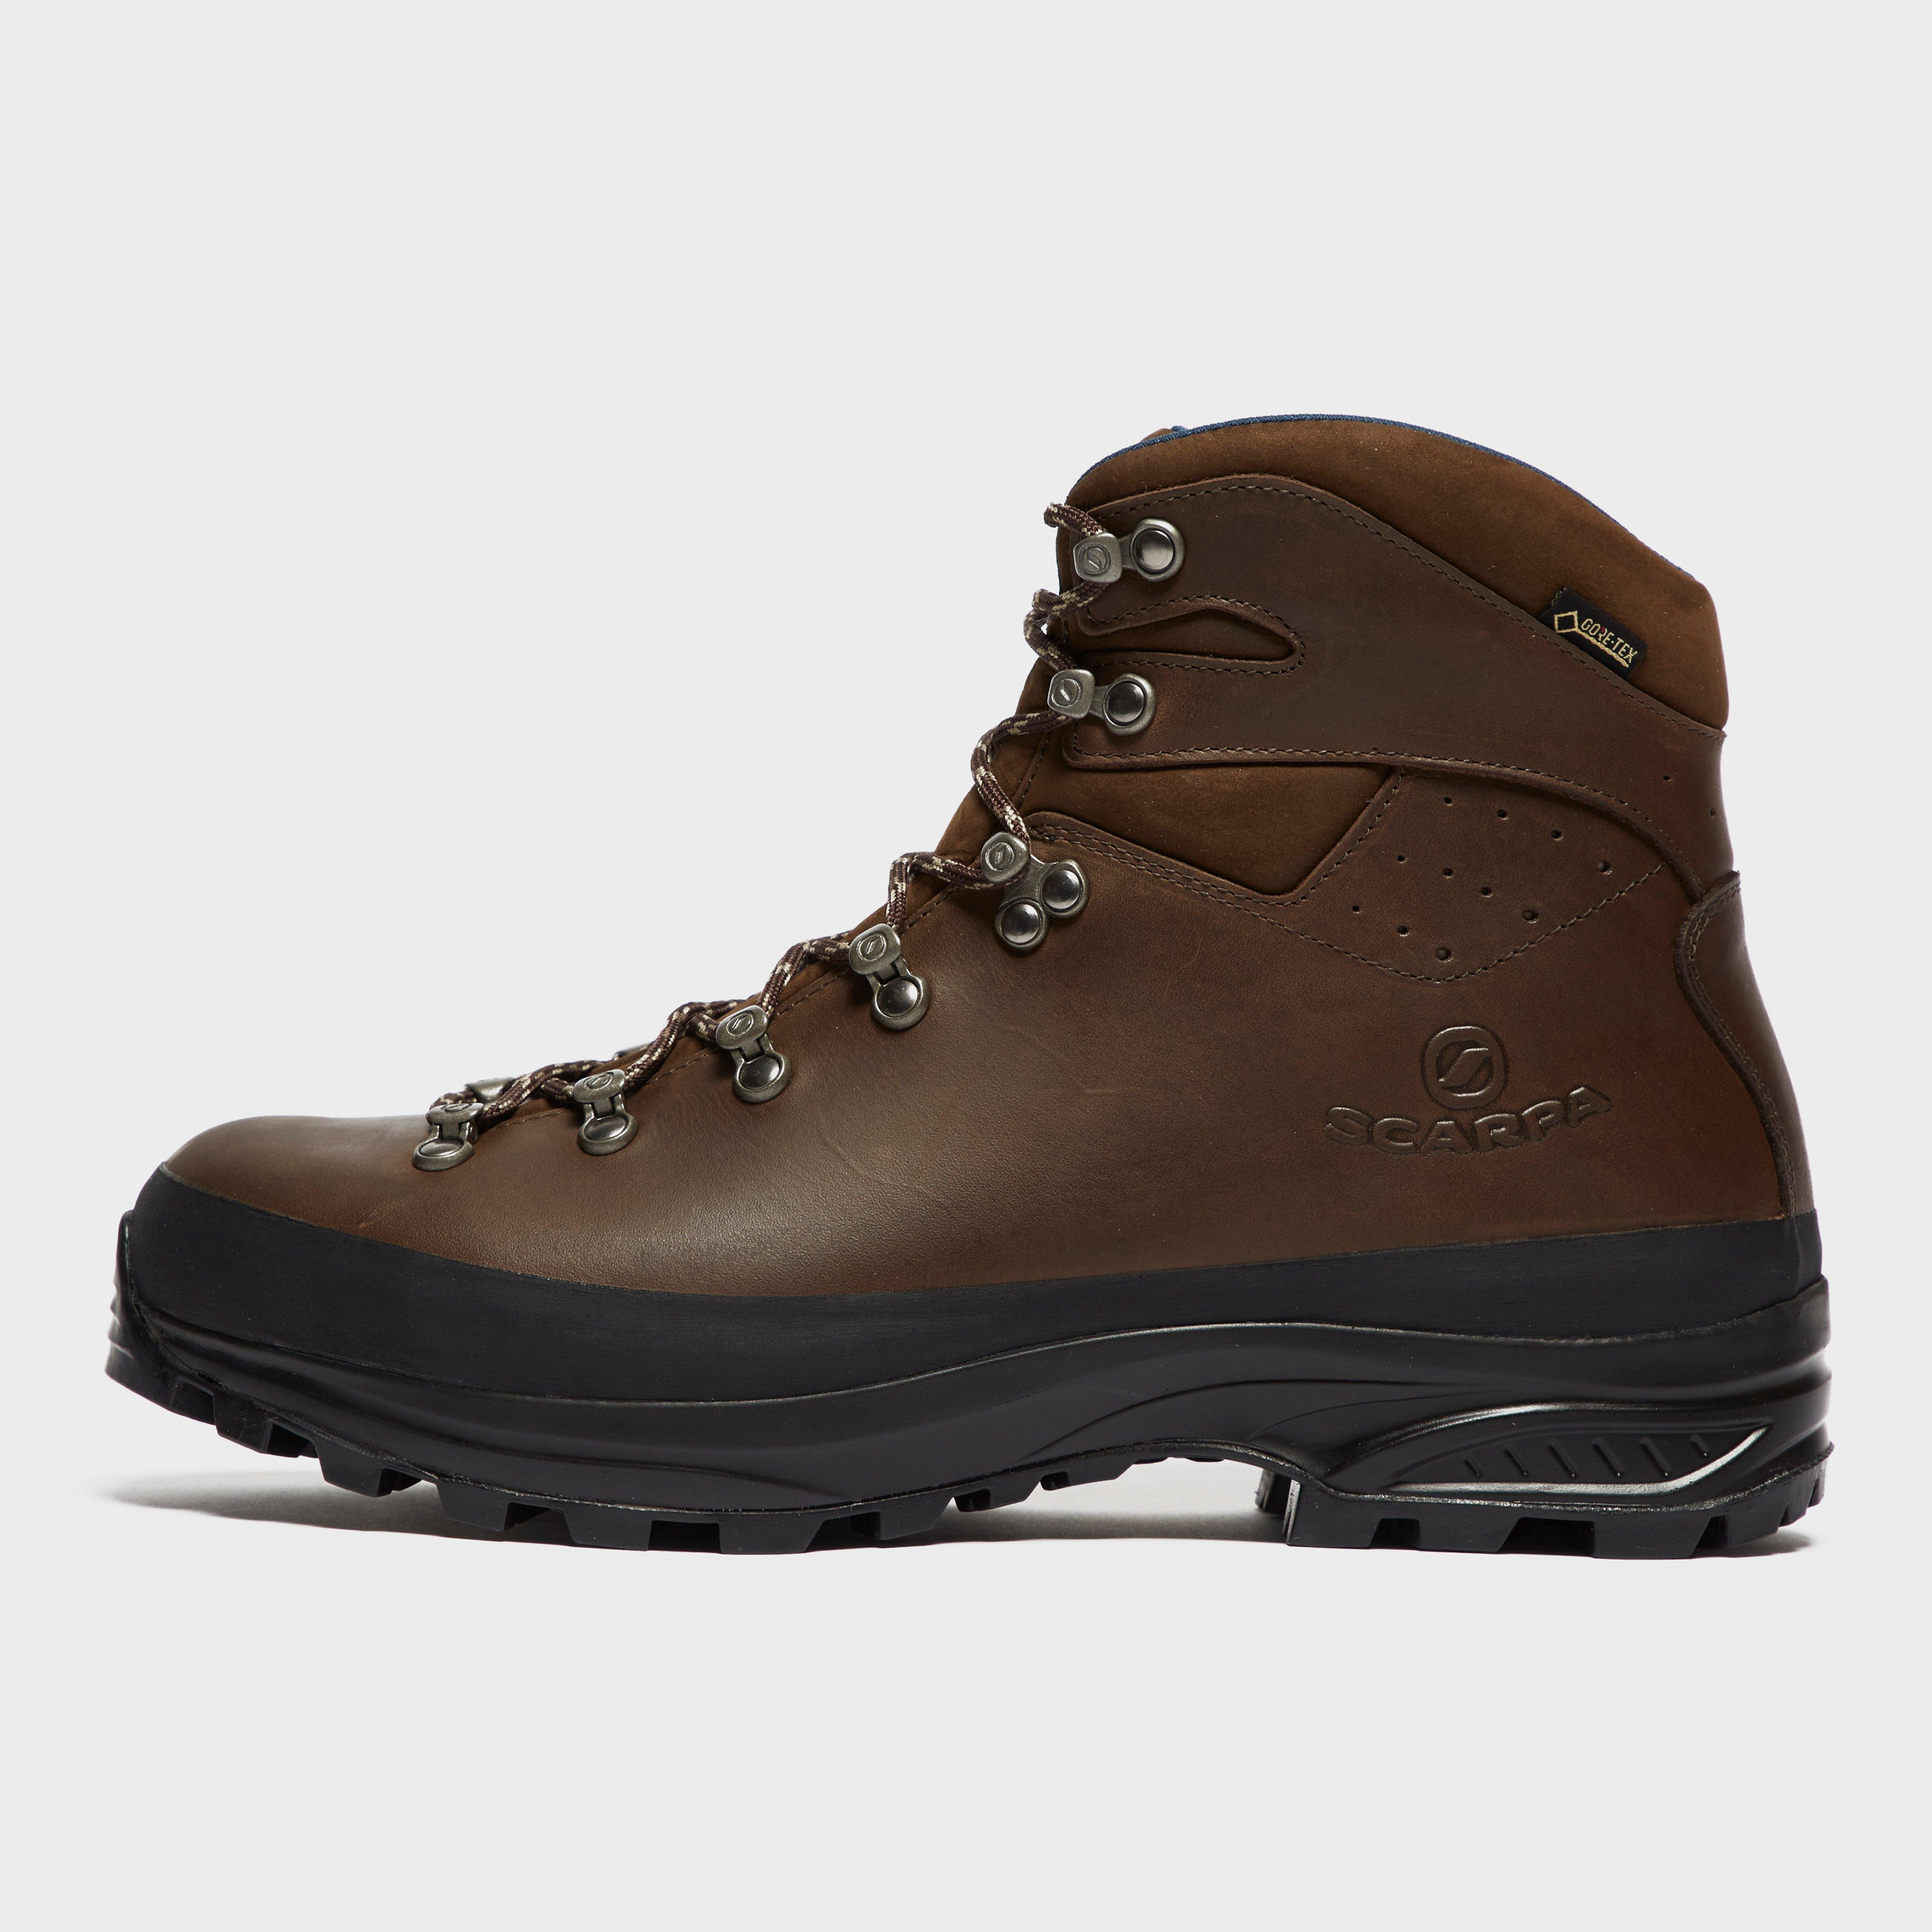 Scarpa Scarpa Mens Trek HV GORE-TEX Boots - Brown, Brown